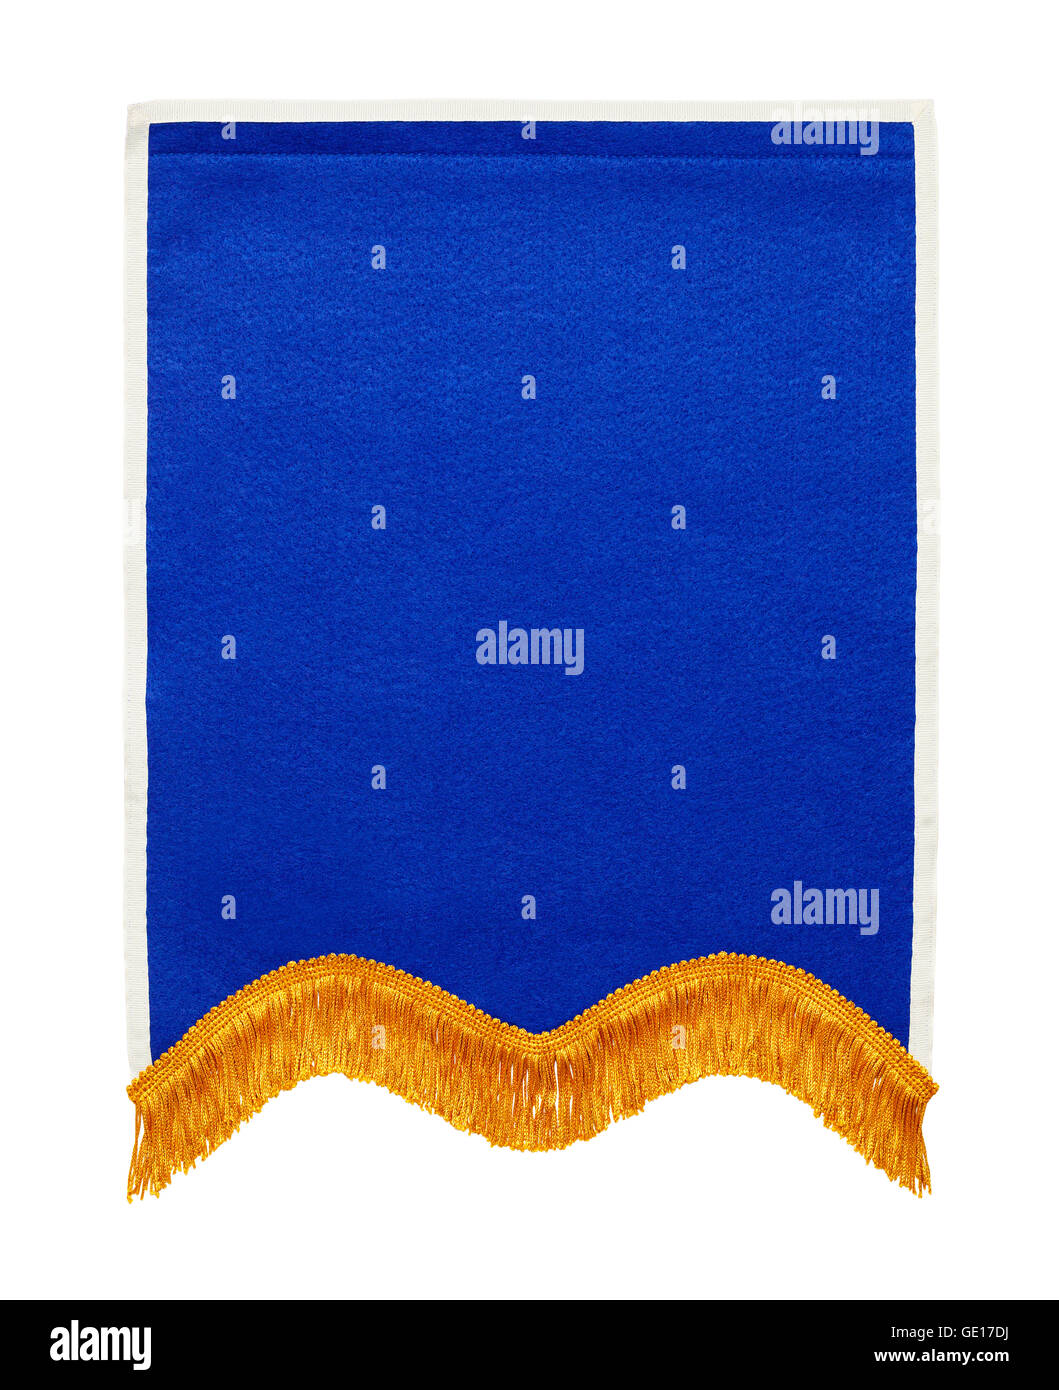 Blue School Award Banner Isolated on White Background. - Stock Image